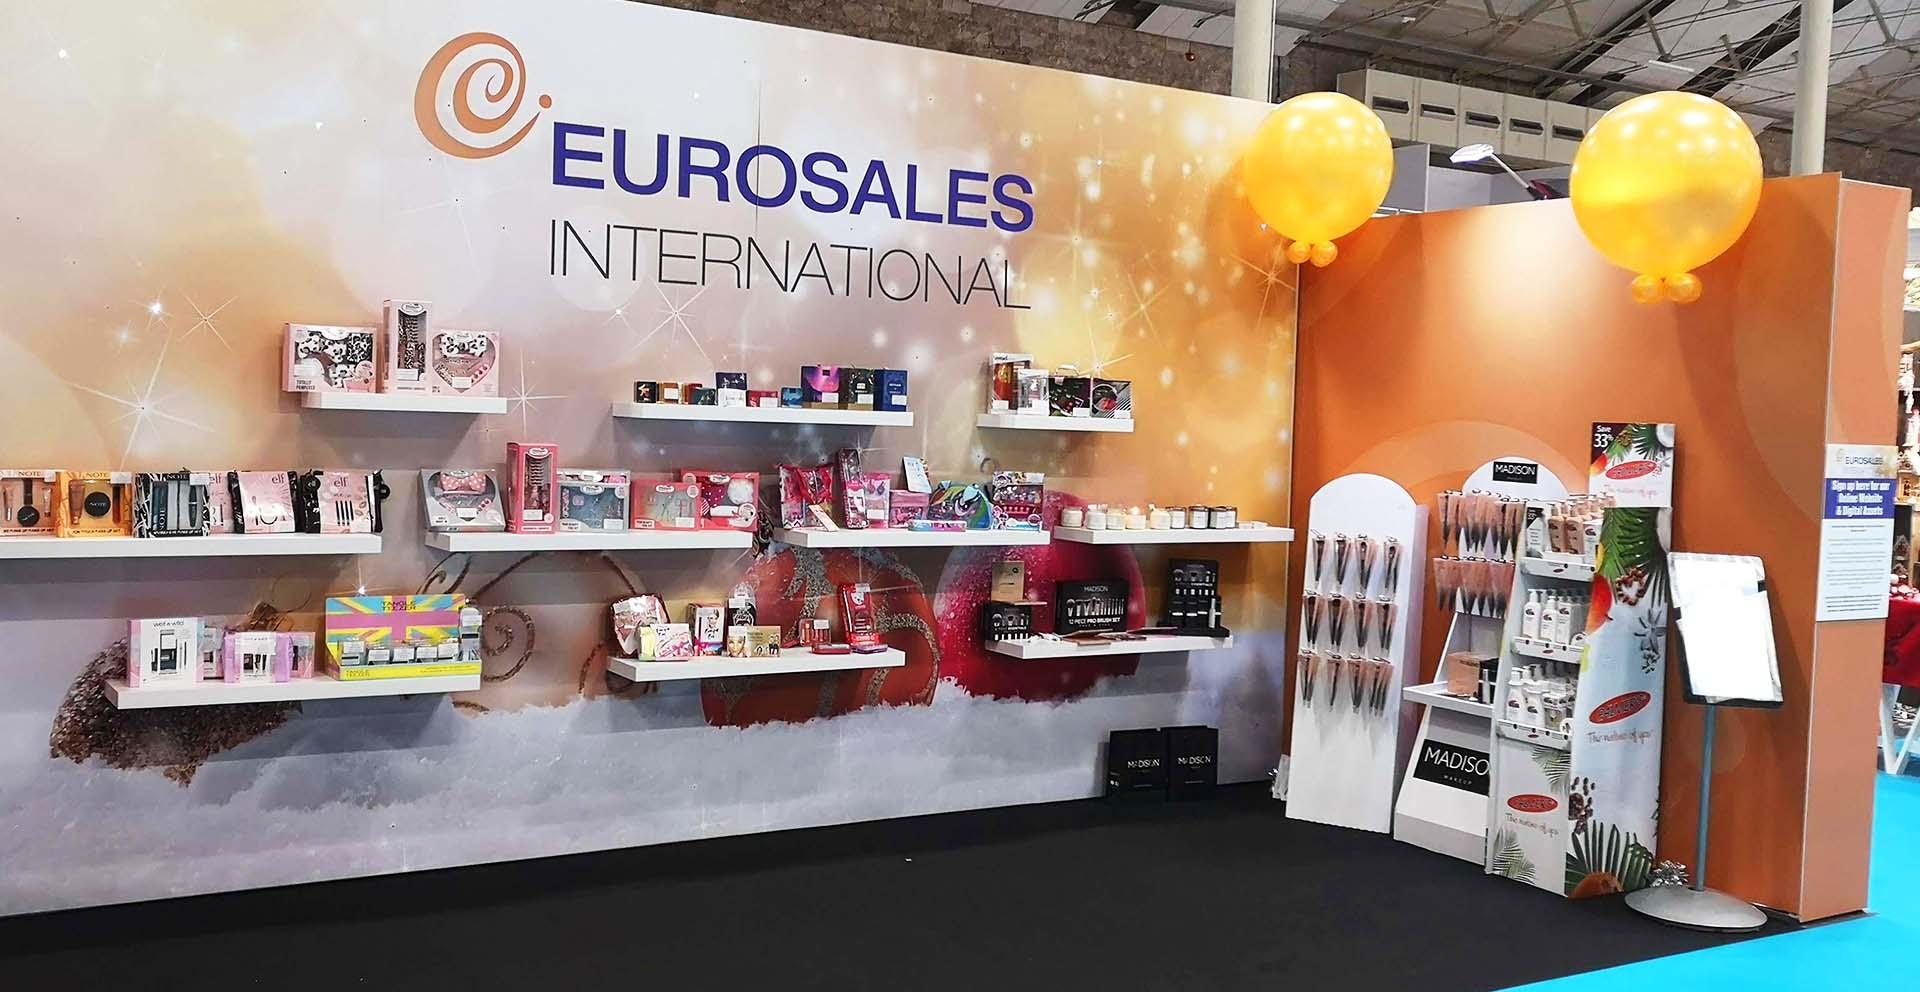 Eurosales Stand 2019 Header